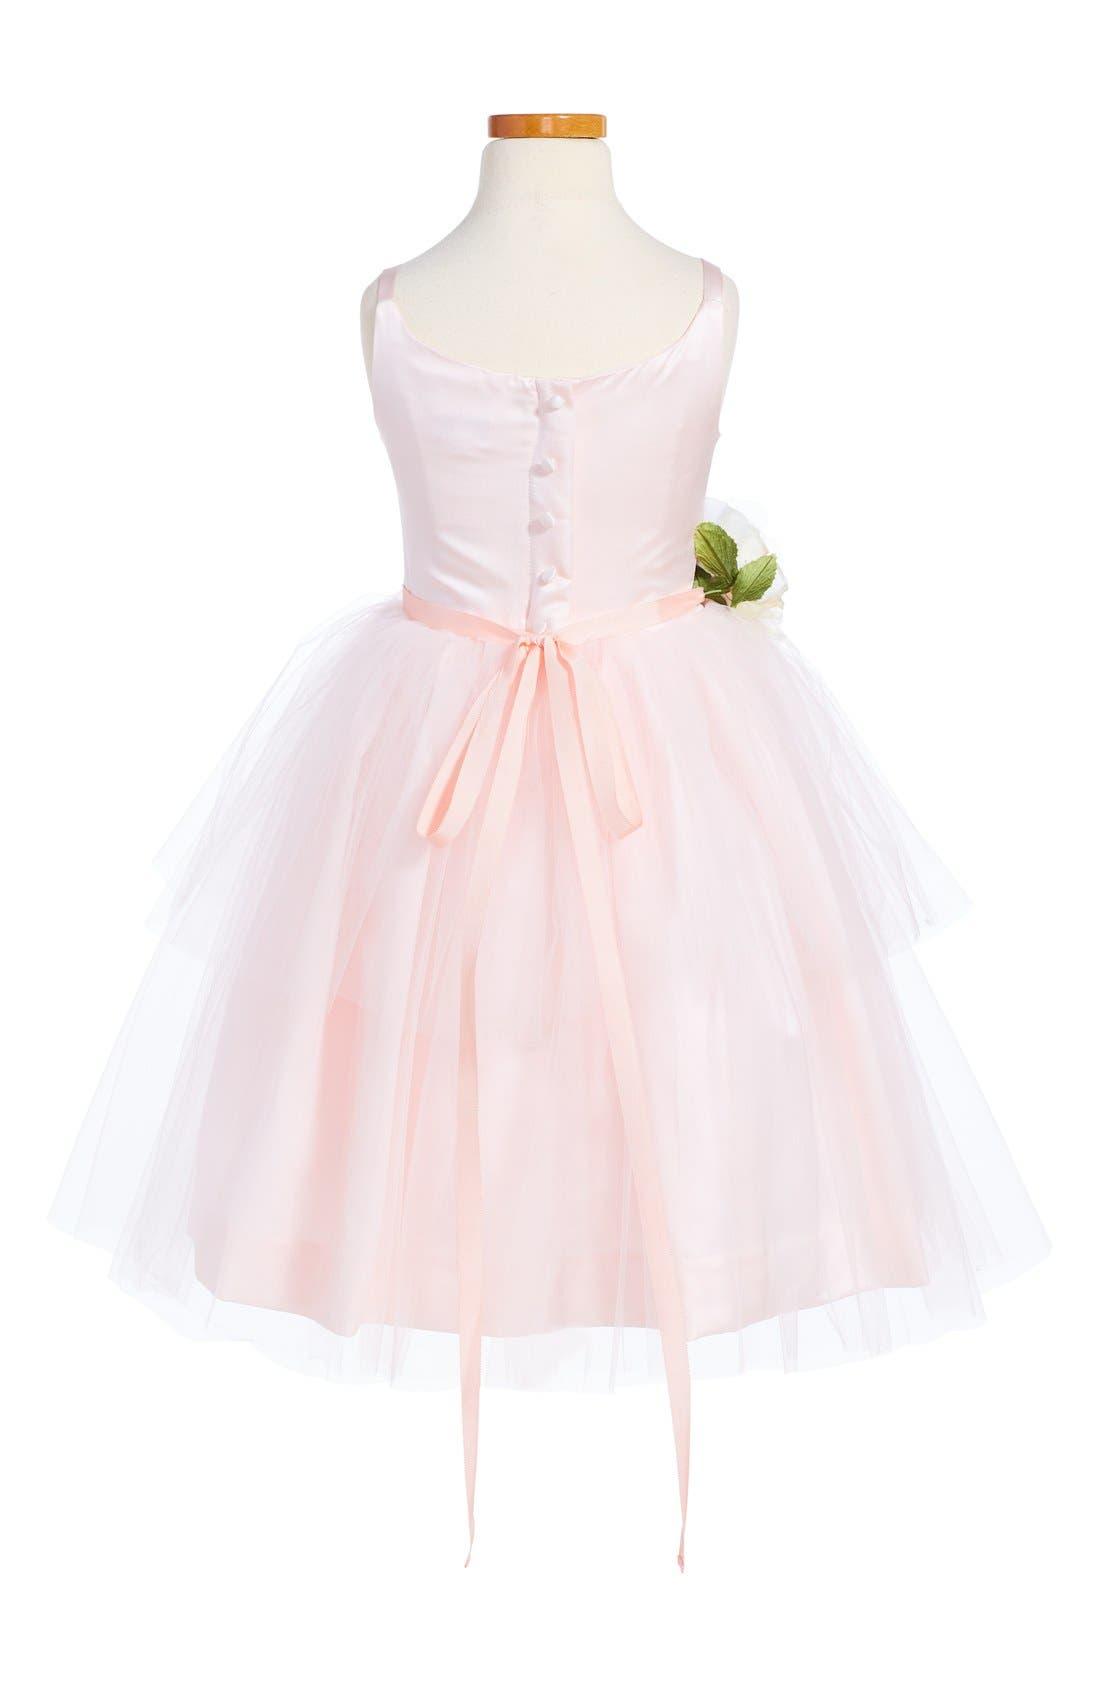 Tulle Ballerina Dress,                             Alternate thumbnail 4, color,                             BLUSH PINK